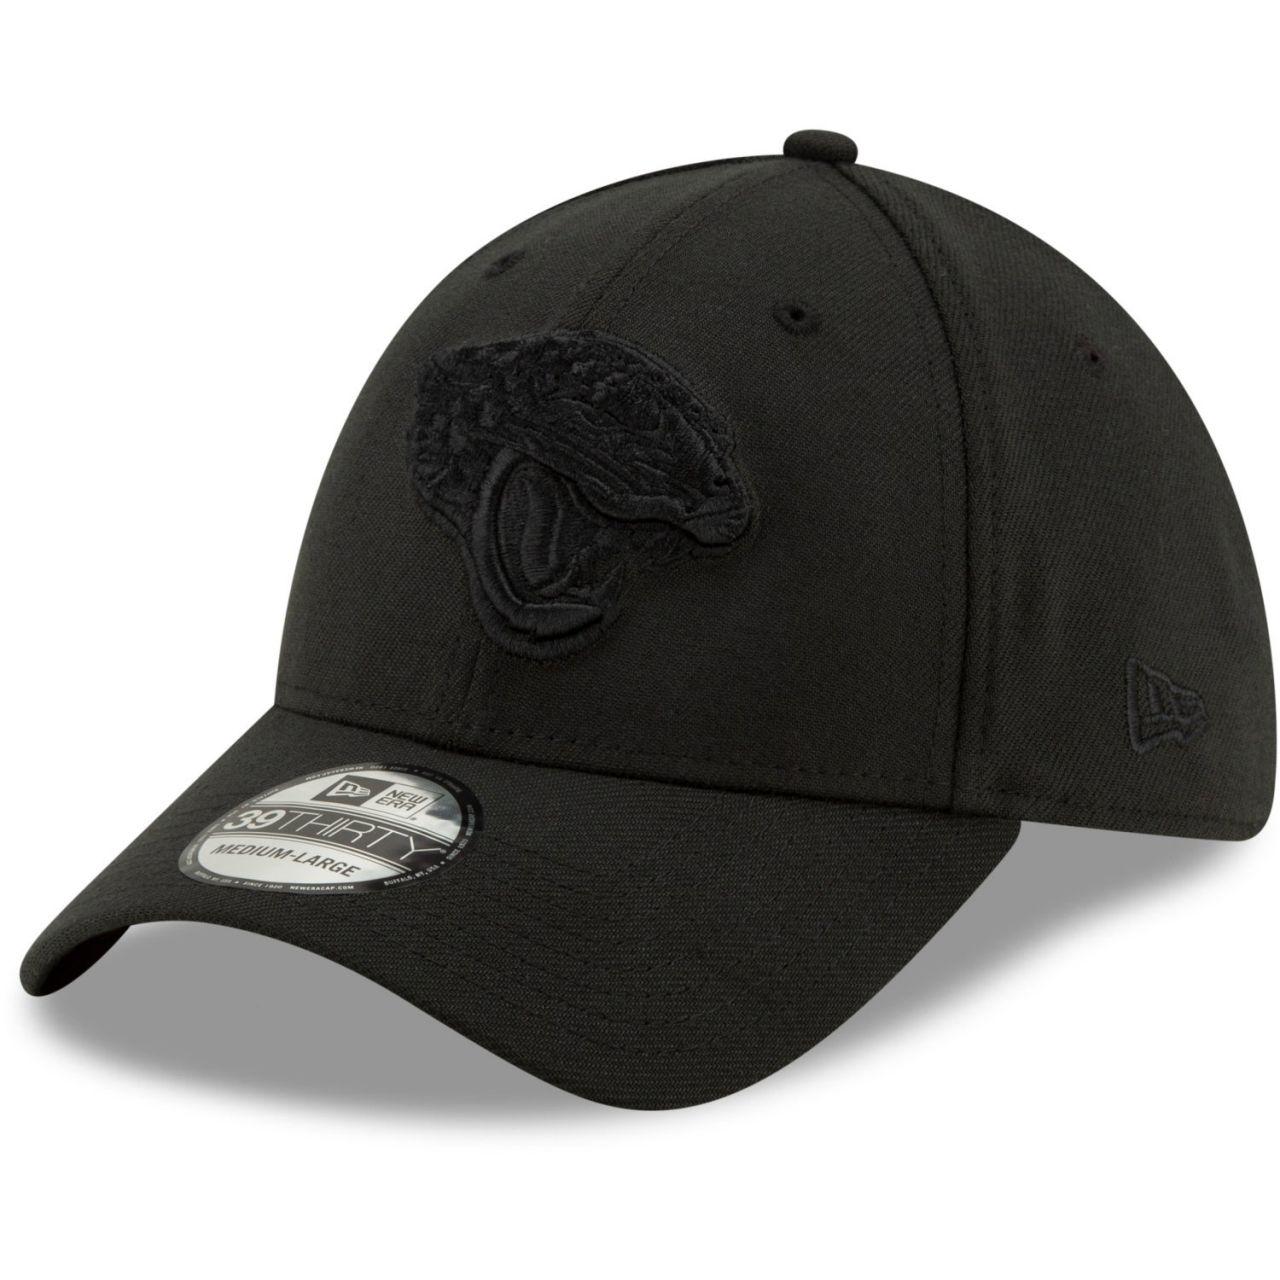 amfoo - New Era 39Thirty Stretch Cap - Jacksonville Jaguars